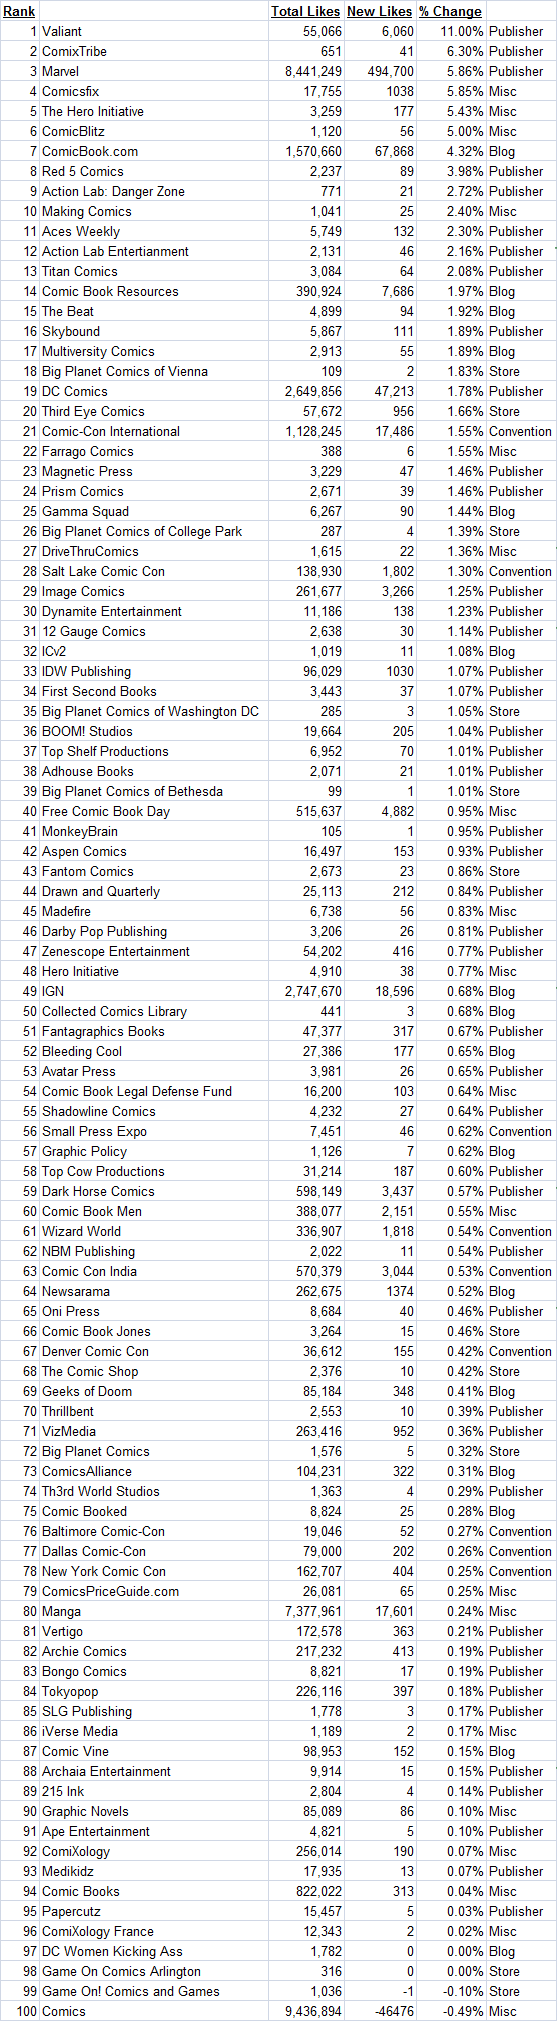 Facebook Percentage 12.1.14